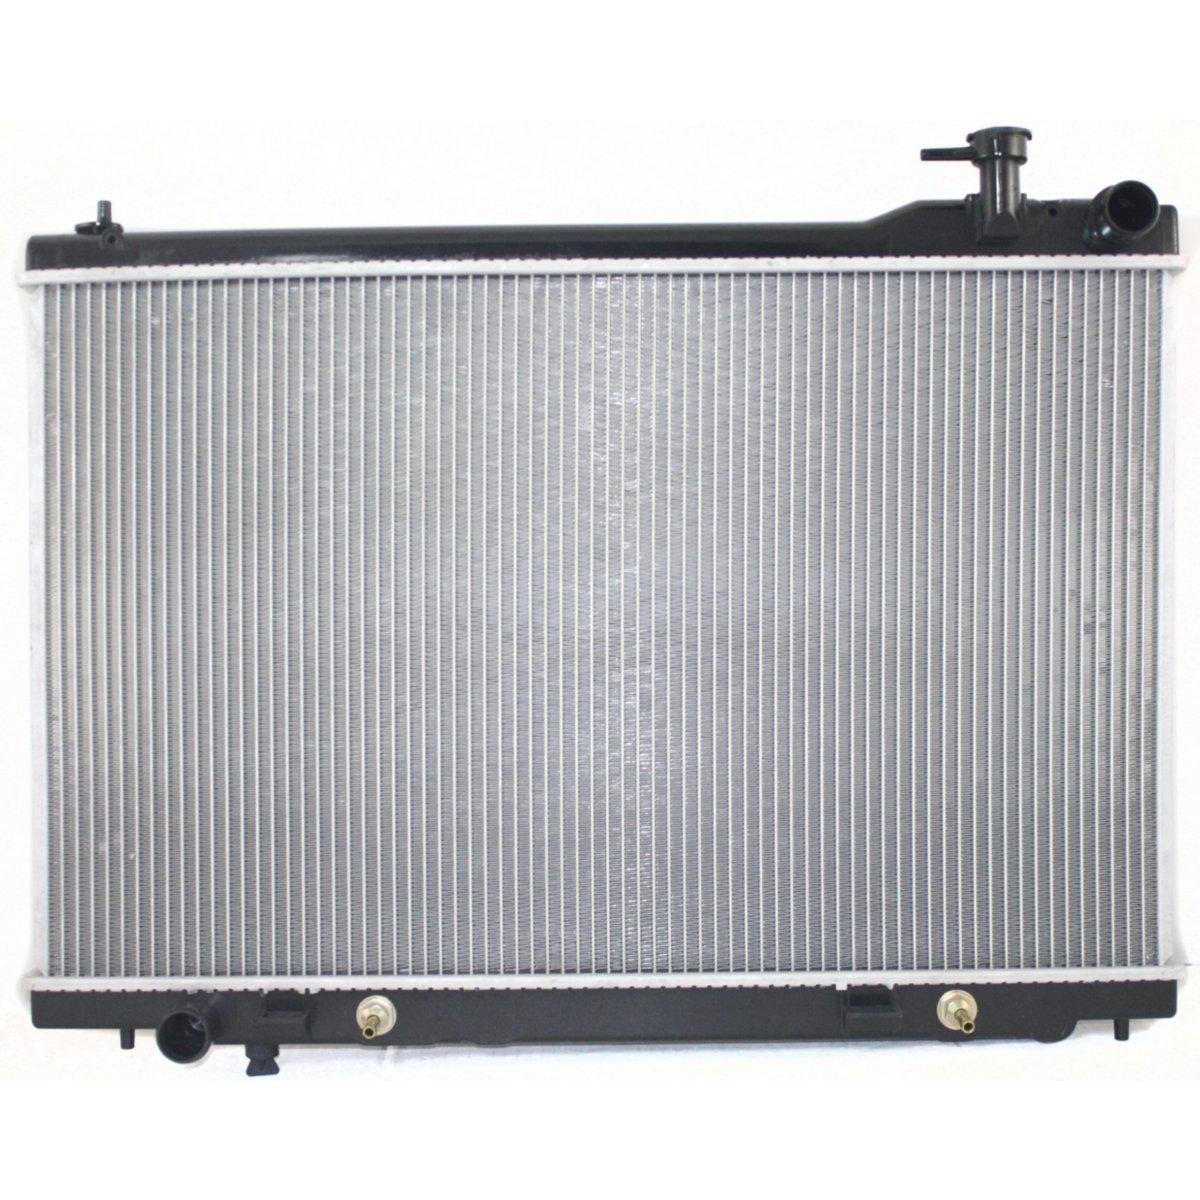 Radiator For 2003-2008 Infiniti FX35 3.5L Engine 1-Row